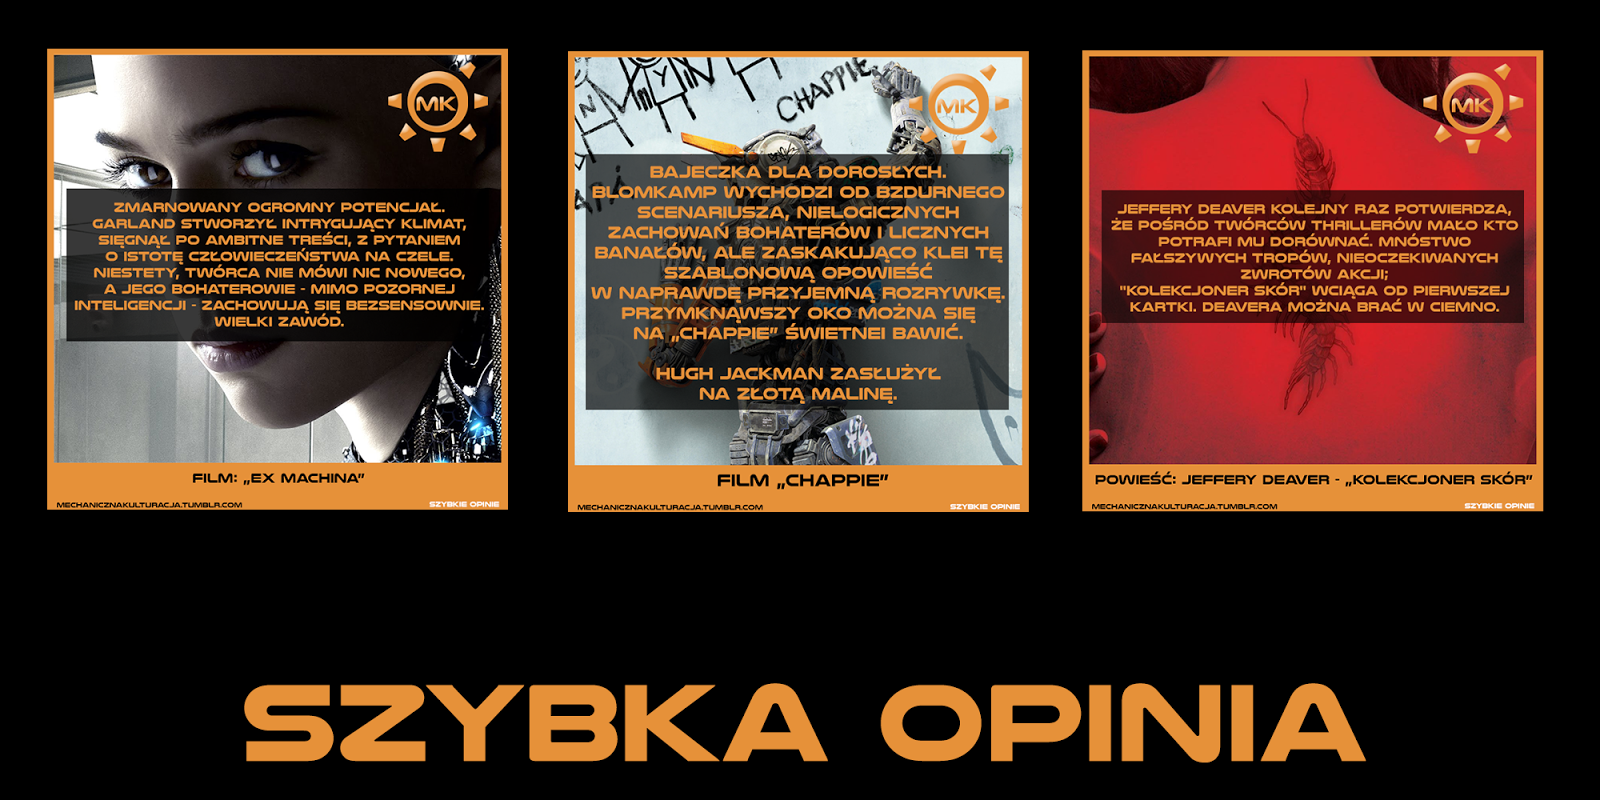 http://mechanicznakulturacja.tumblr.com/tagged/szybka-opinia